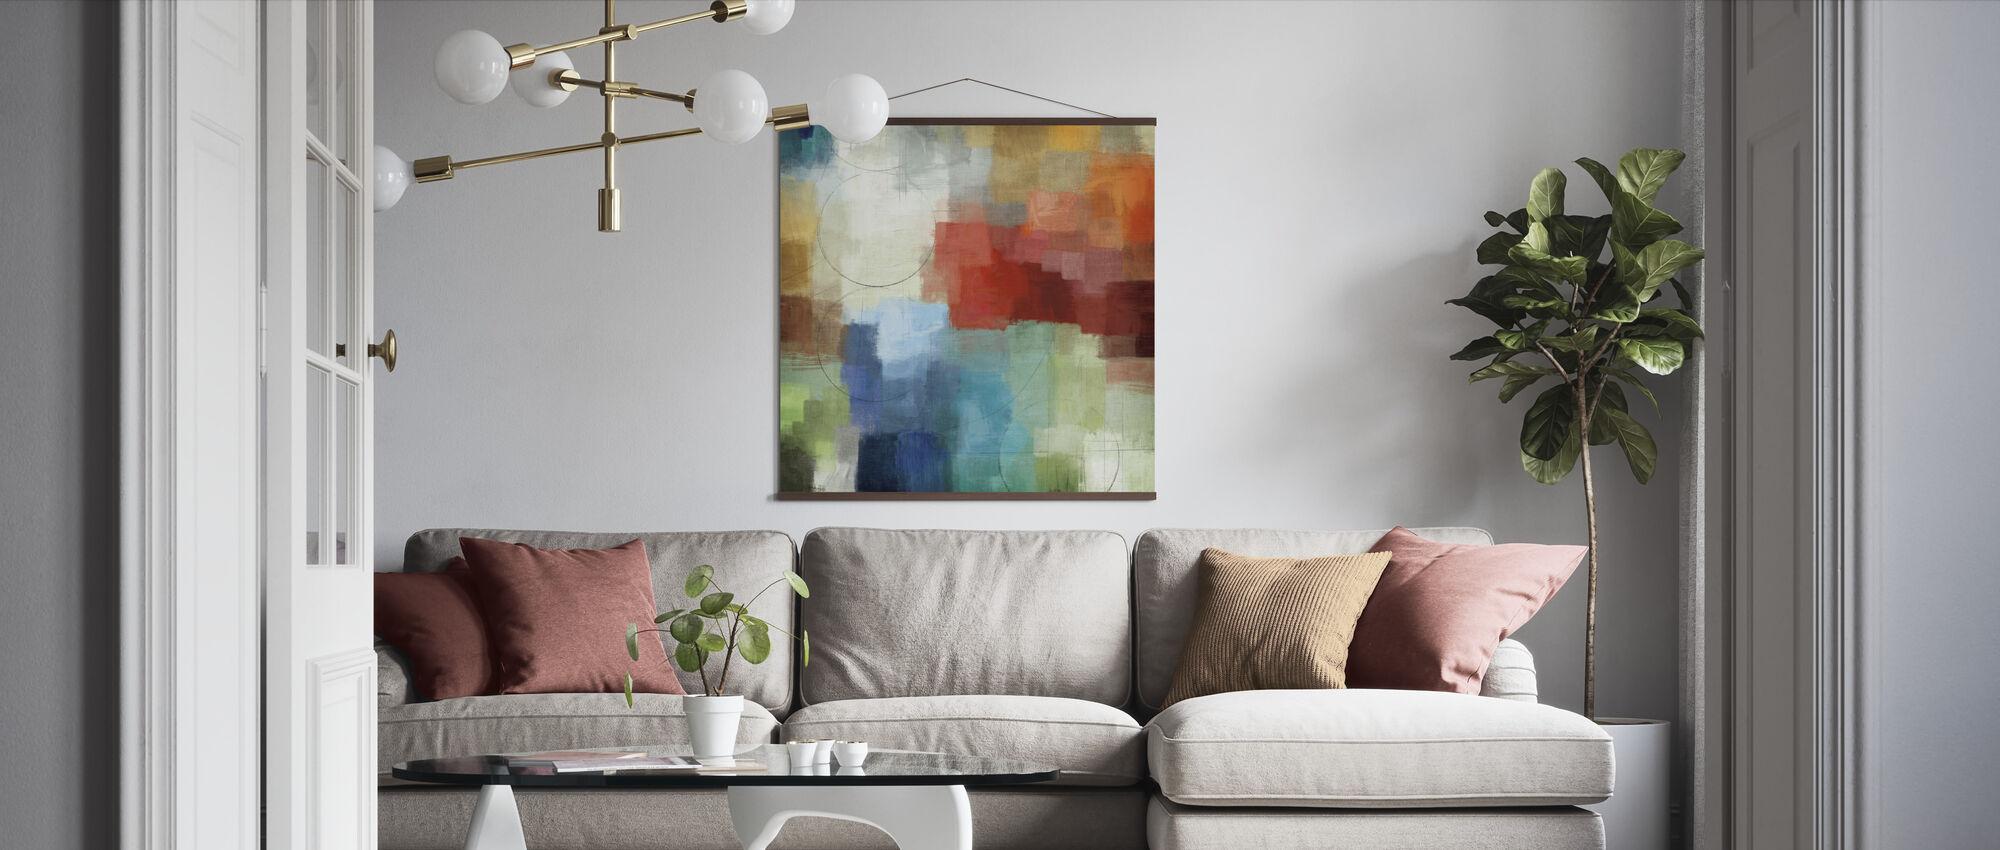 Seasons - Poster - Living Room